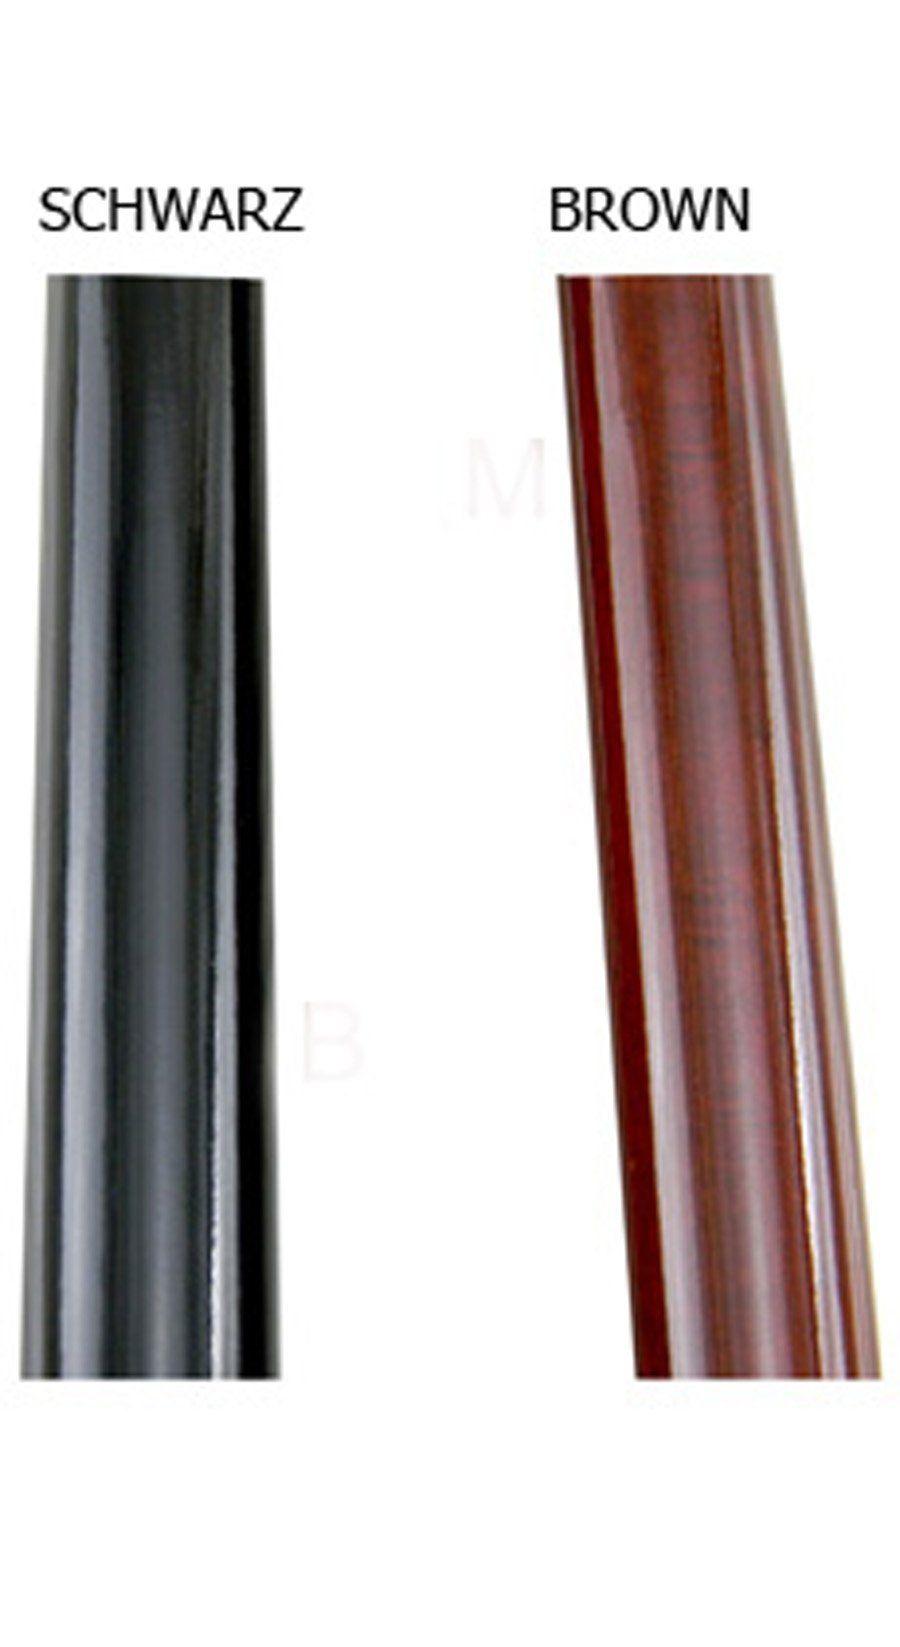 Spazierstock Elegant Gehstock Holz Elegant Damen Vintage Silber